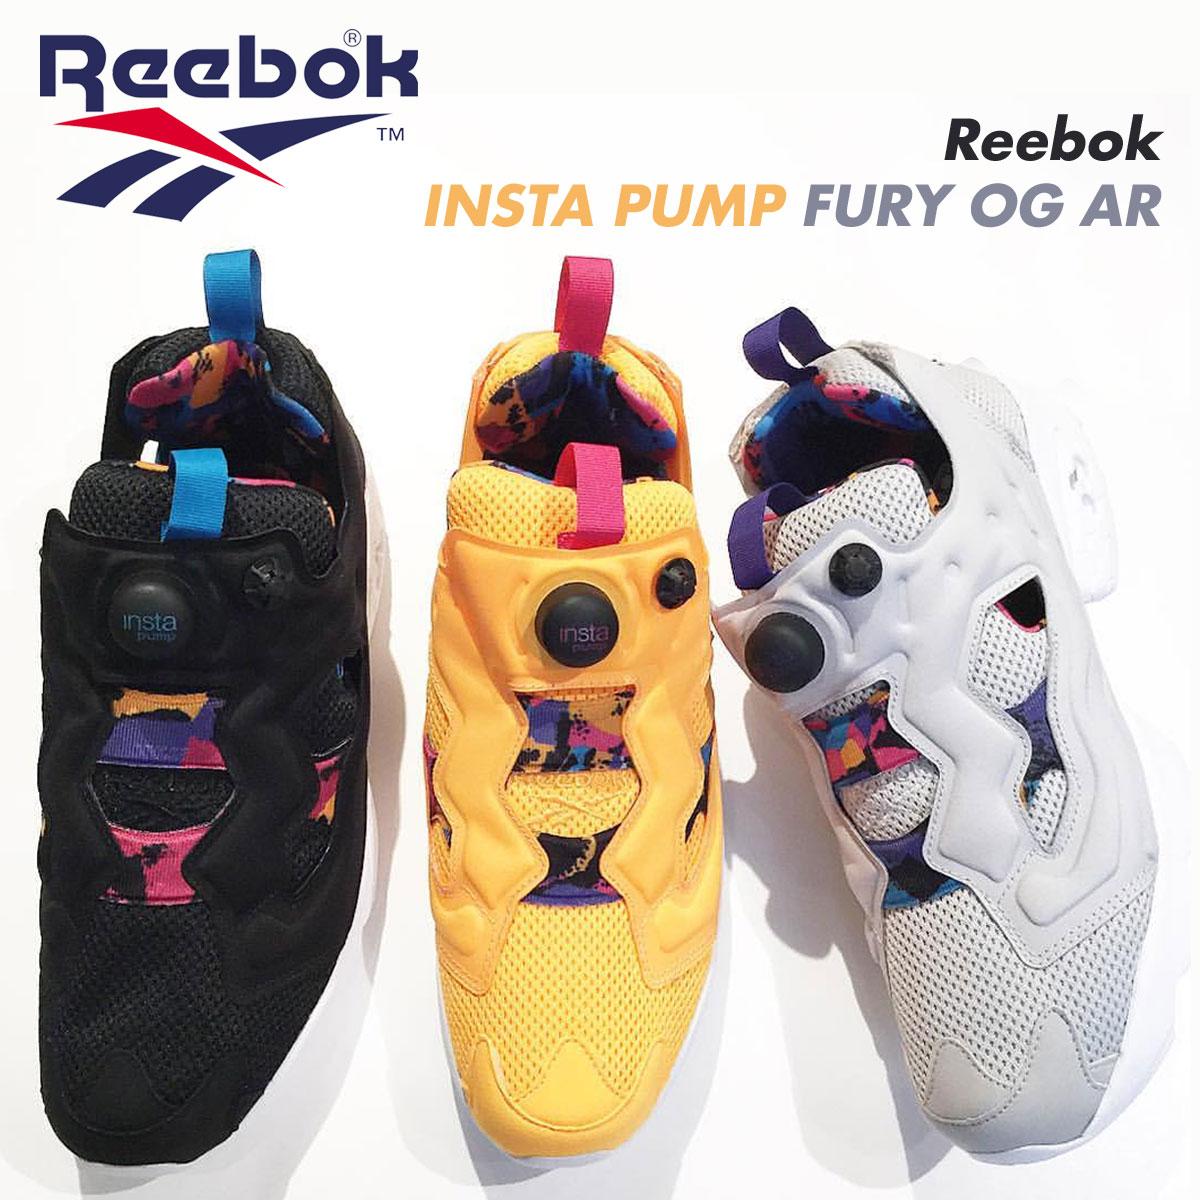 954868267578 Reebok ポンプフューリースニーカーリーボック INSTA PUMP FURY OG AR BD1506 BD1507 BD1508 men  shoes gray  4 19 Shinnyu load   174